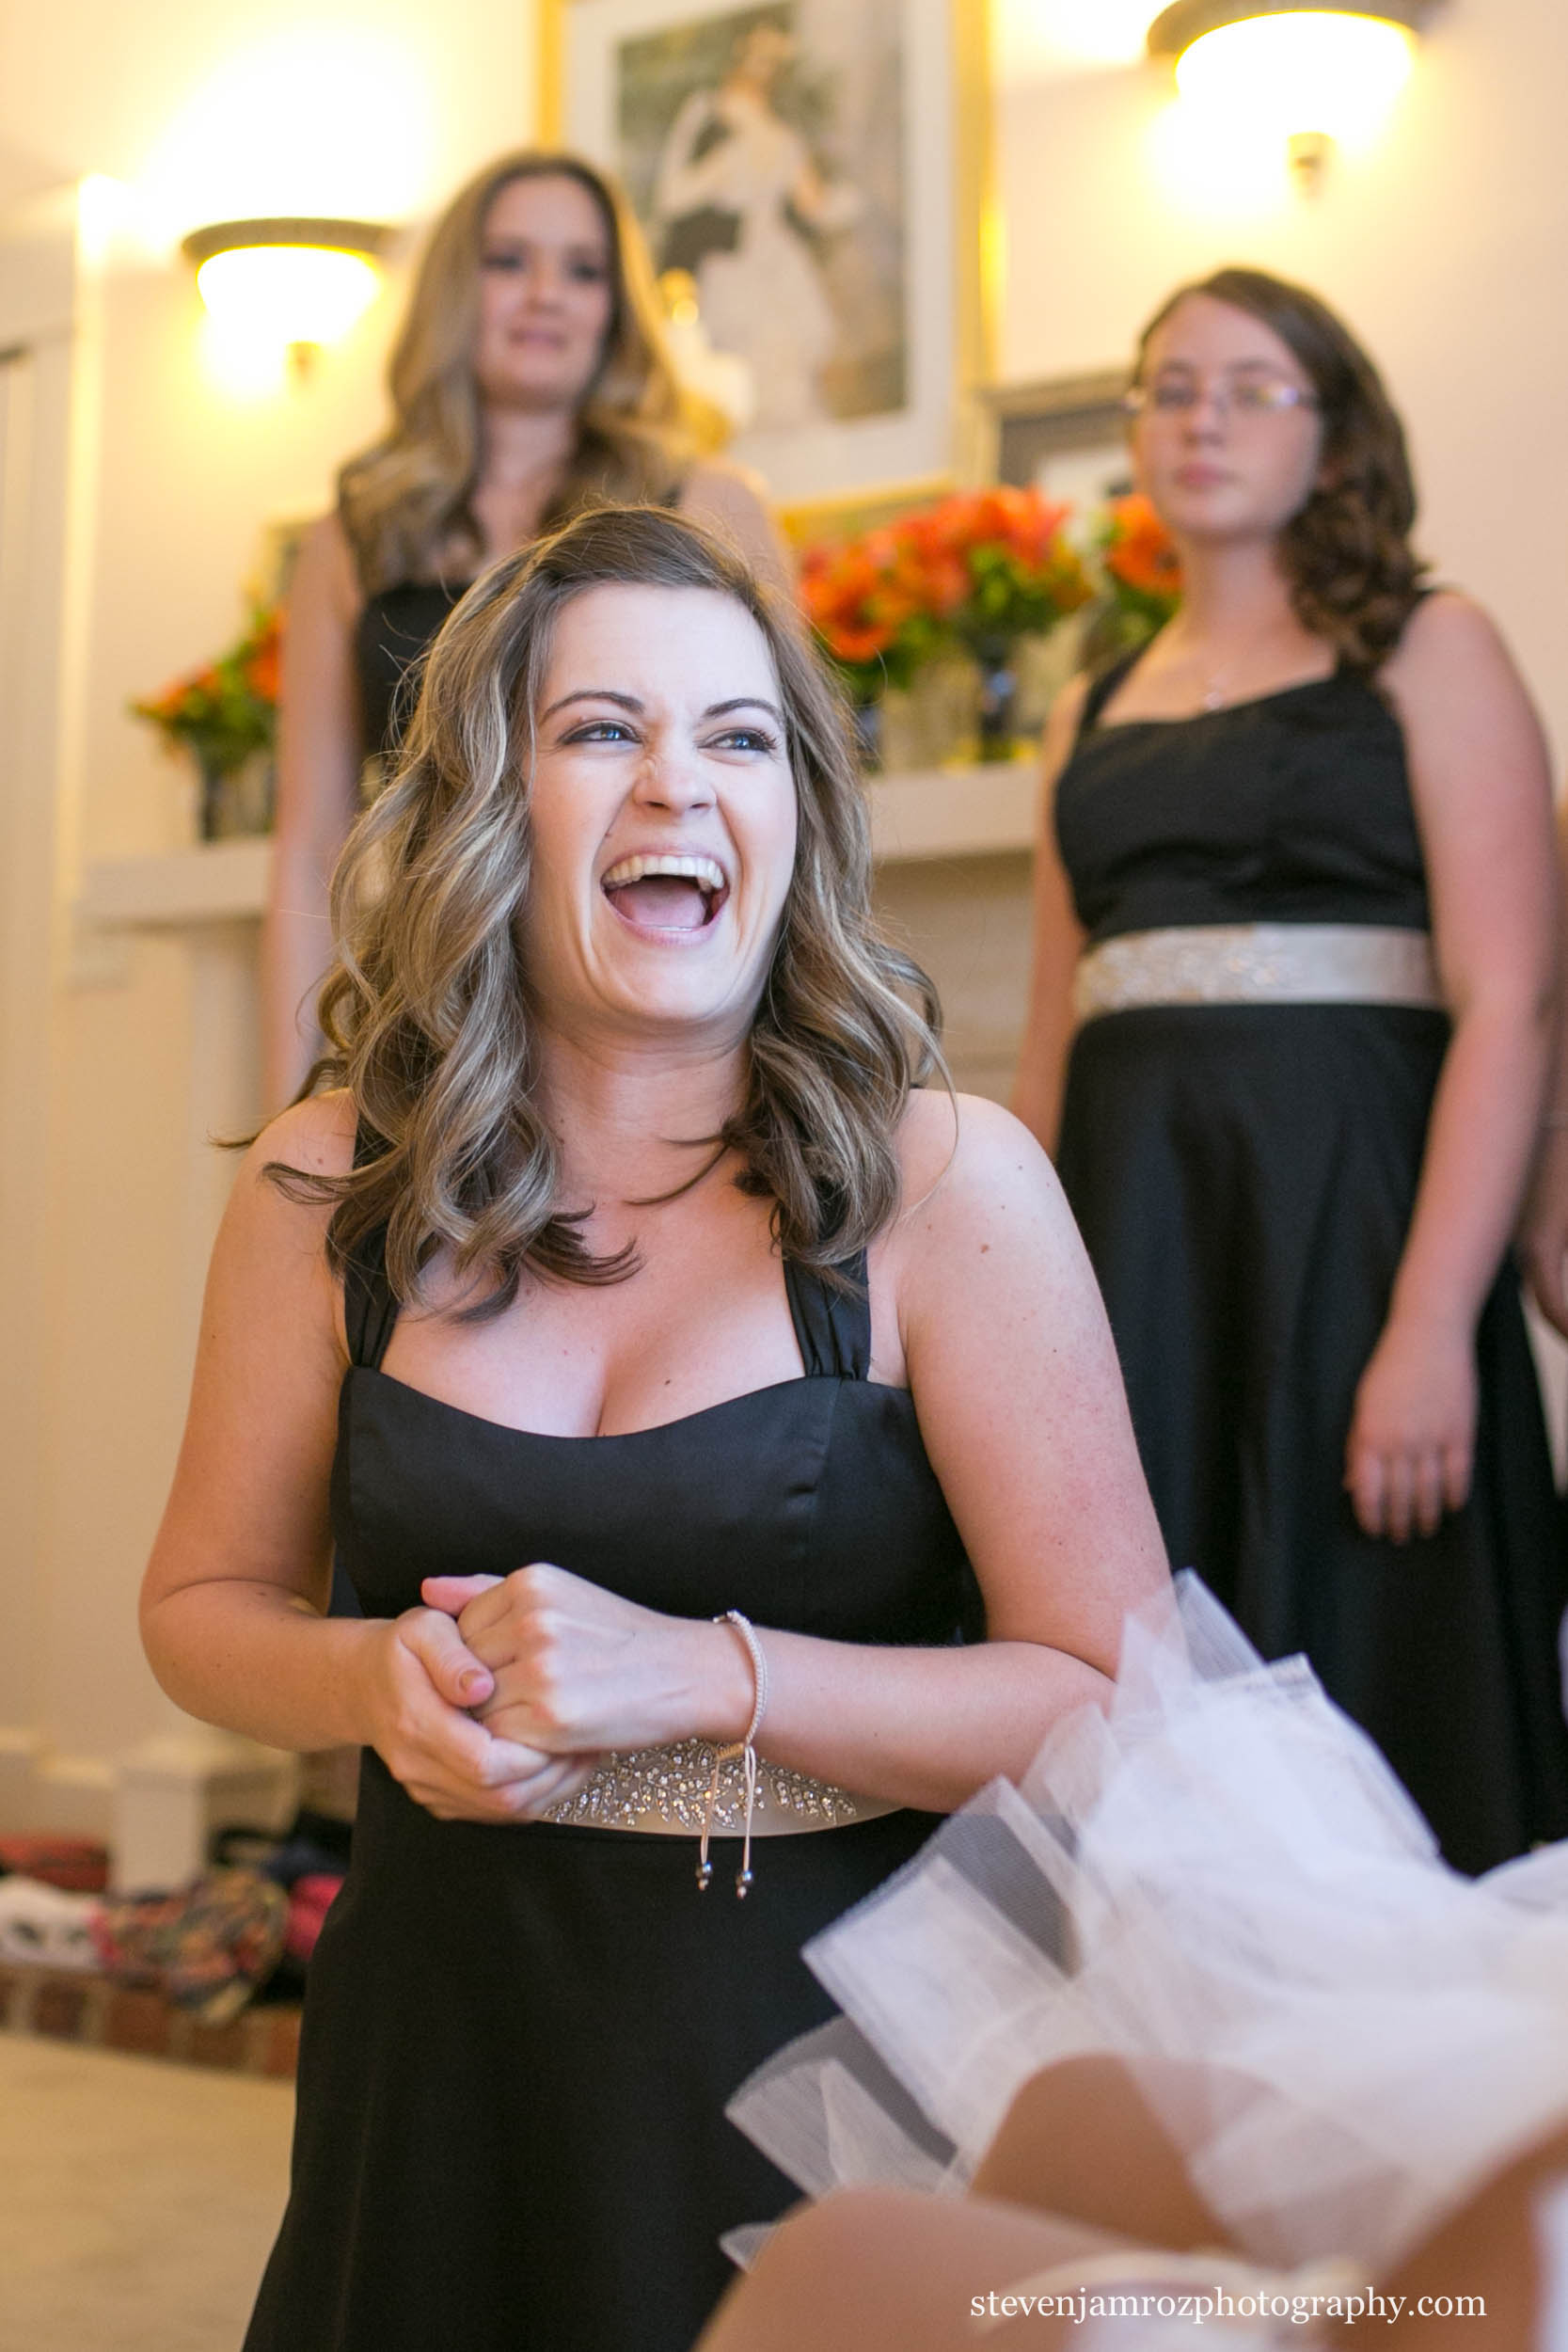 bridesmaids-help-bride-nc-steven-jamroz-photography-0215.jpg